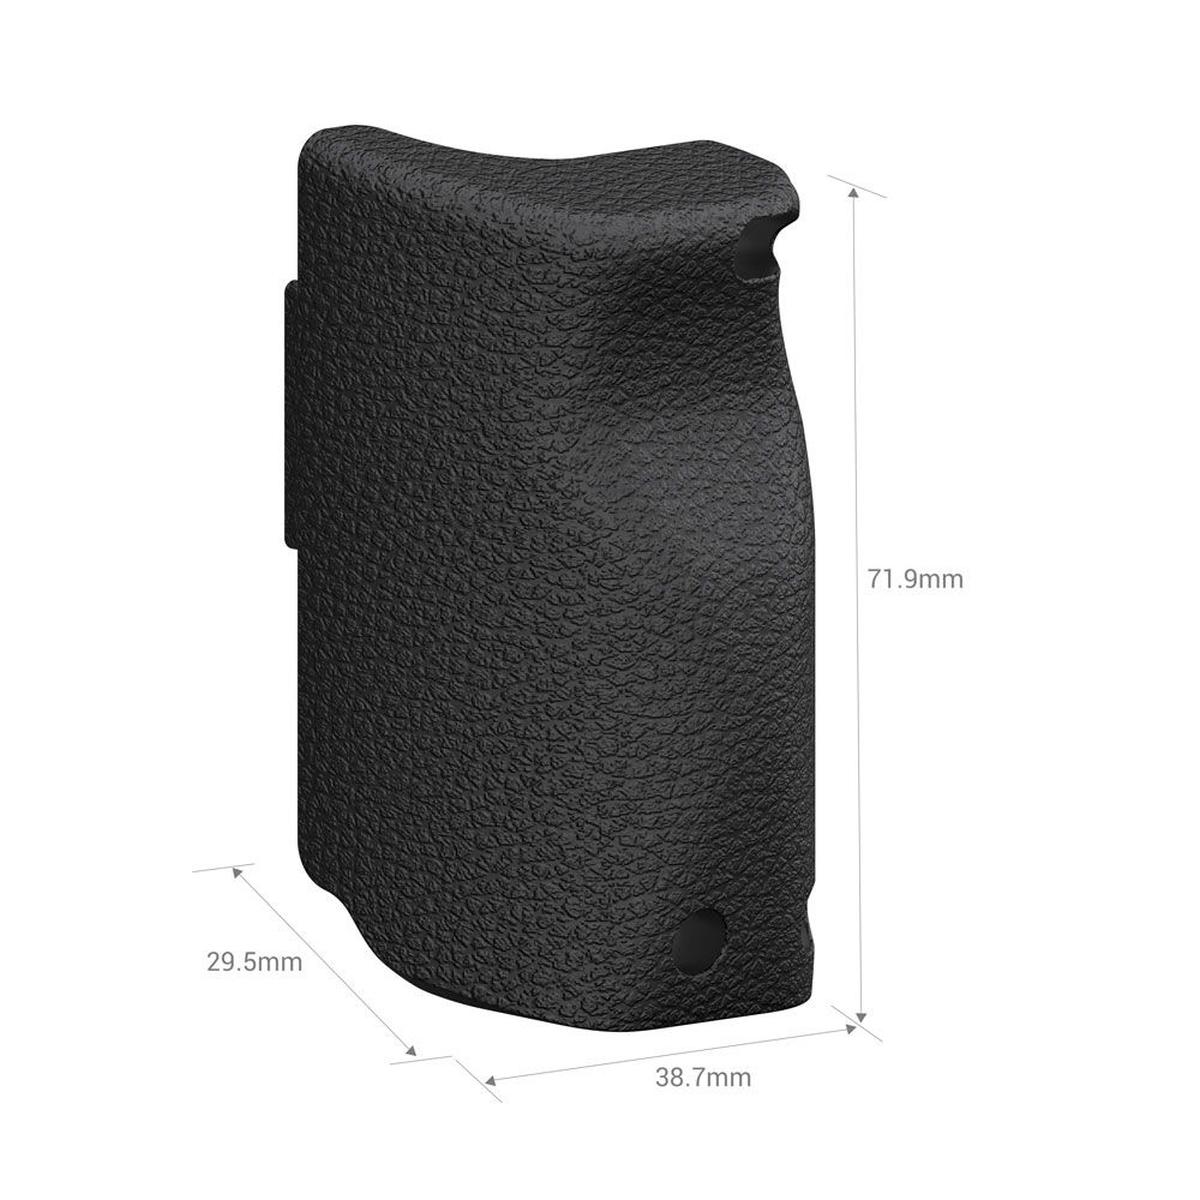 Smallrig Silikon Handgriff für Sony Alpha 6000 / 6300 / 6400 2788